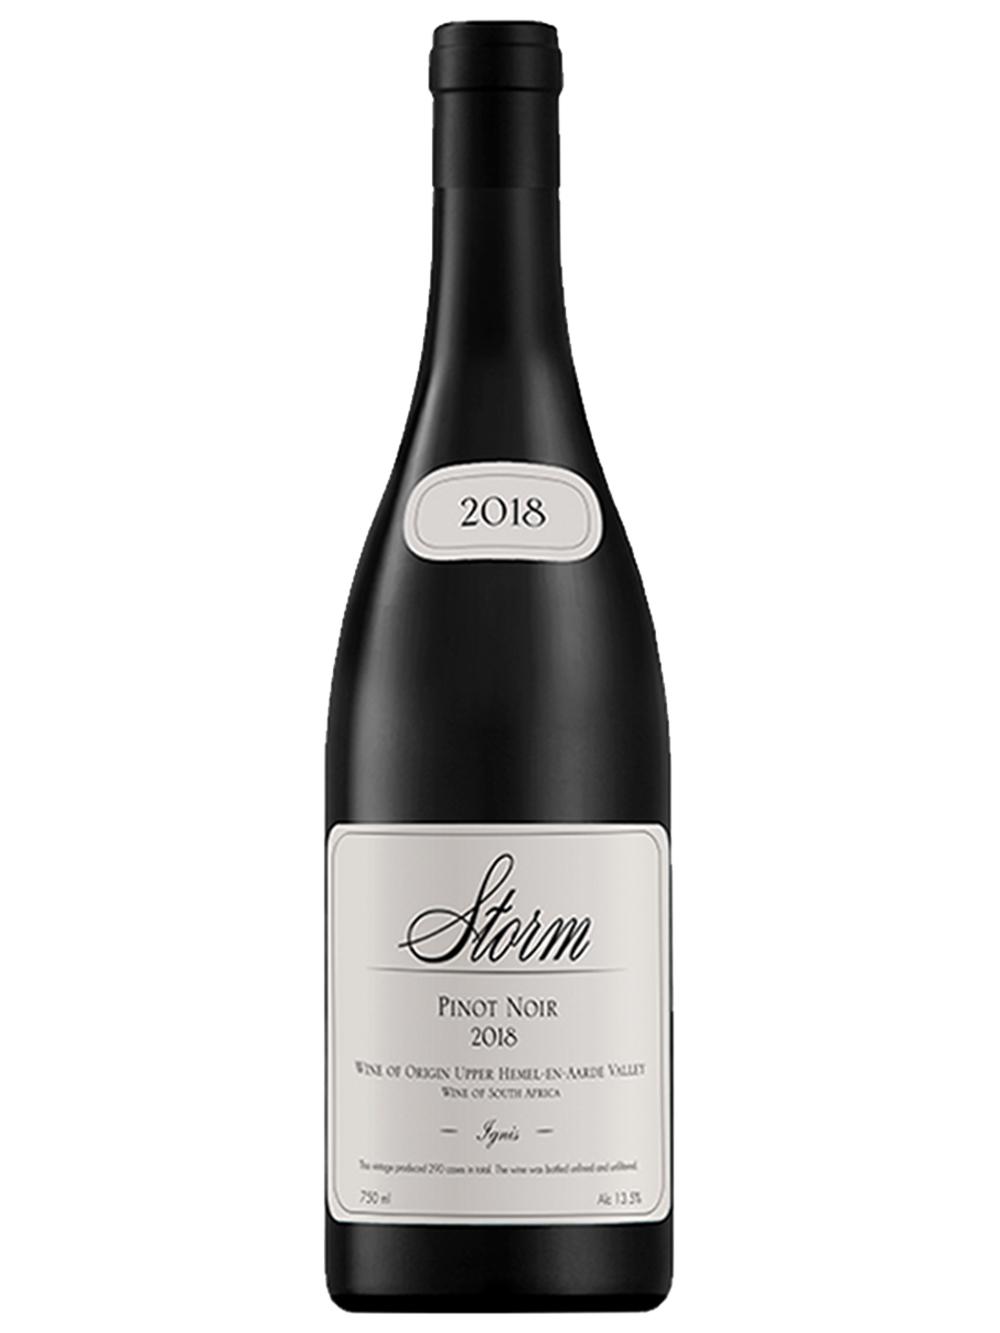 2018 Ignis Pinot Noir